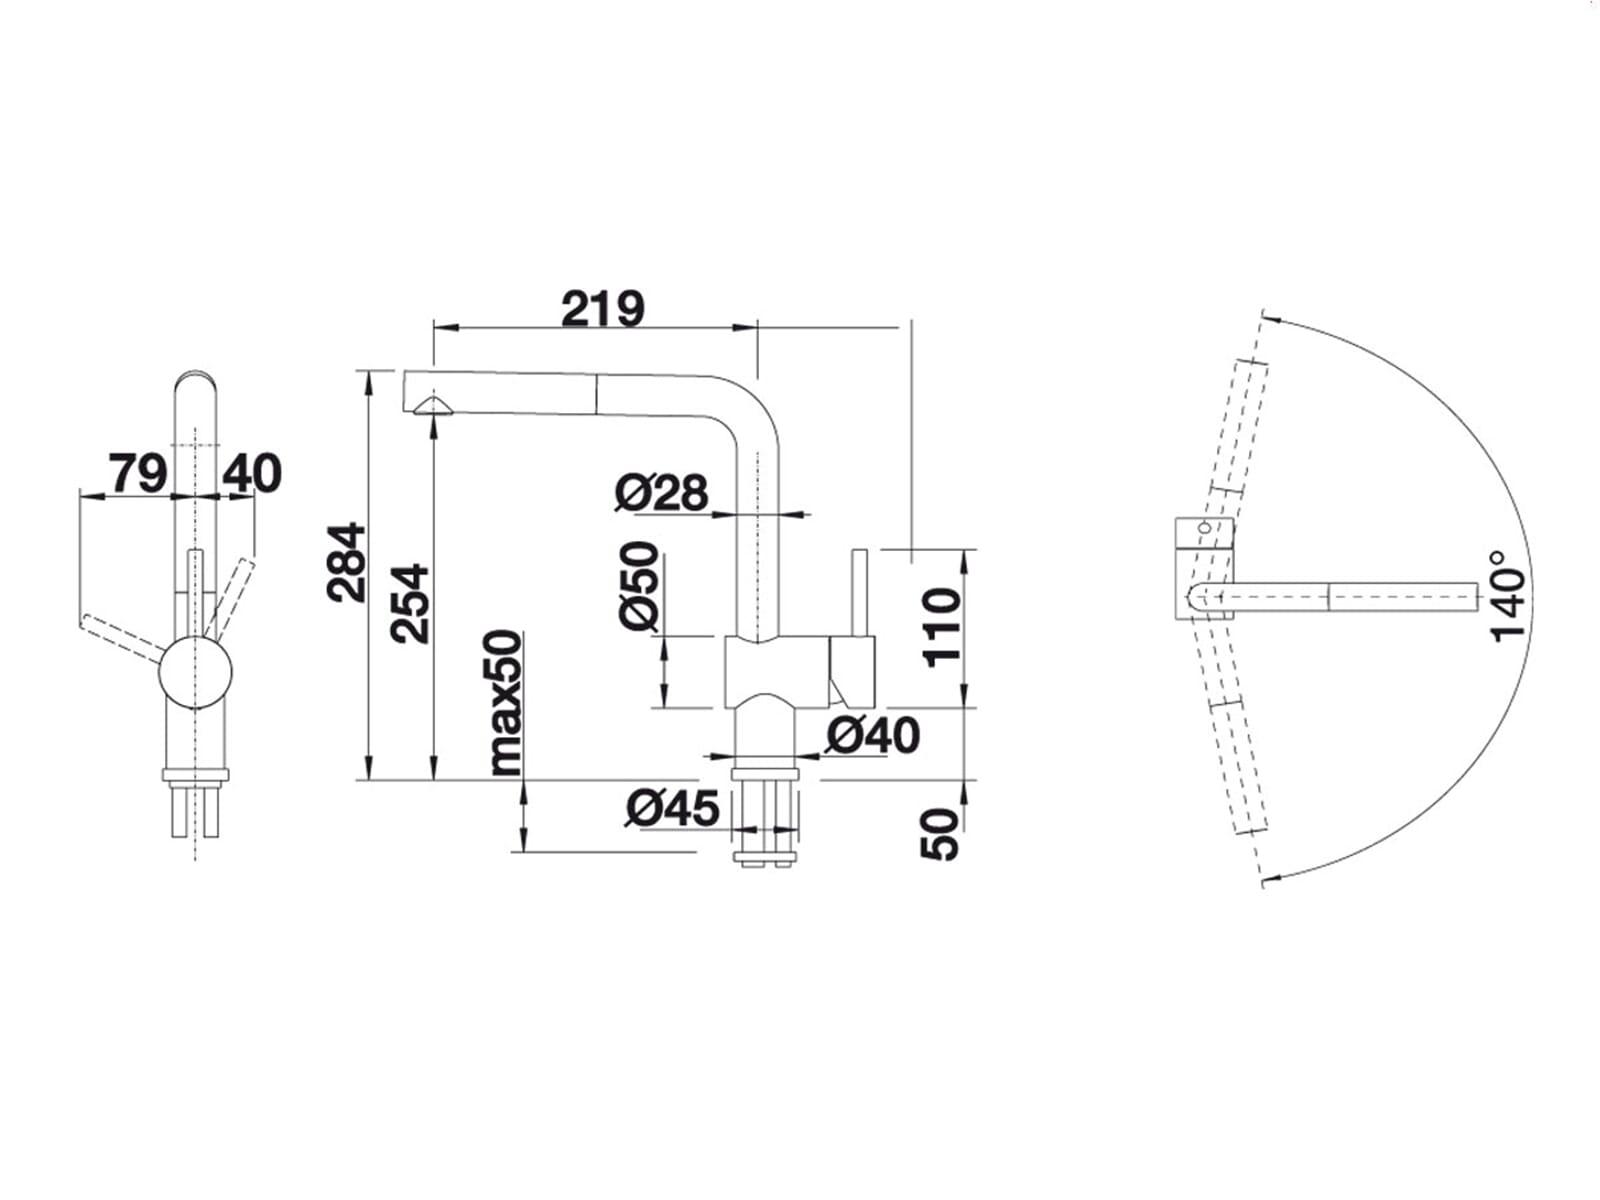 blanco armatur niederdruck blanco vitis chrom niederdruck nd with blanco armatur niederdruck. Black Bedroom Furniture Sets. Home Design Ideas